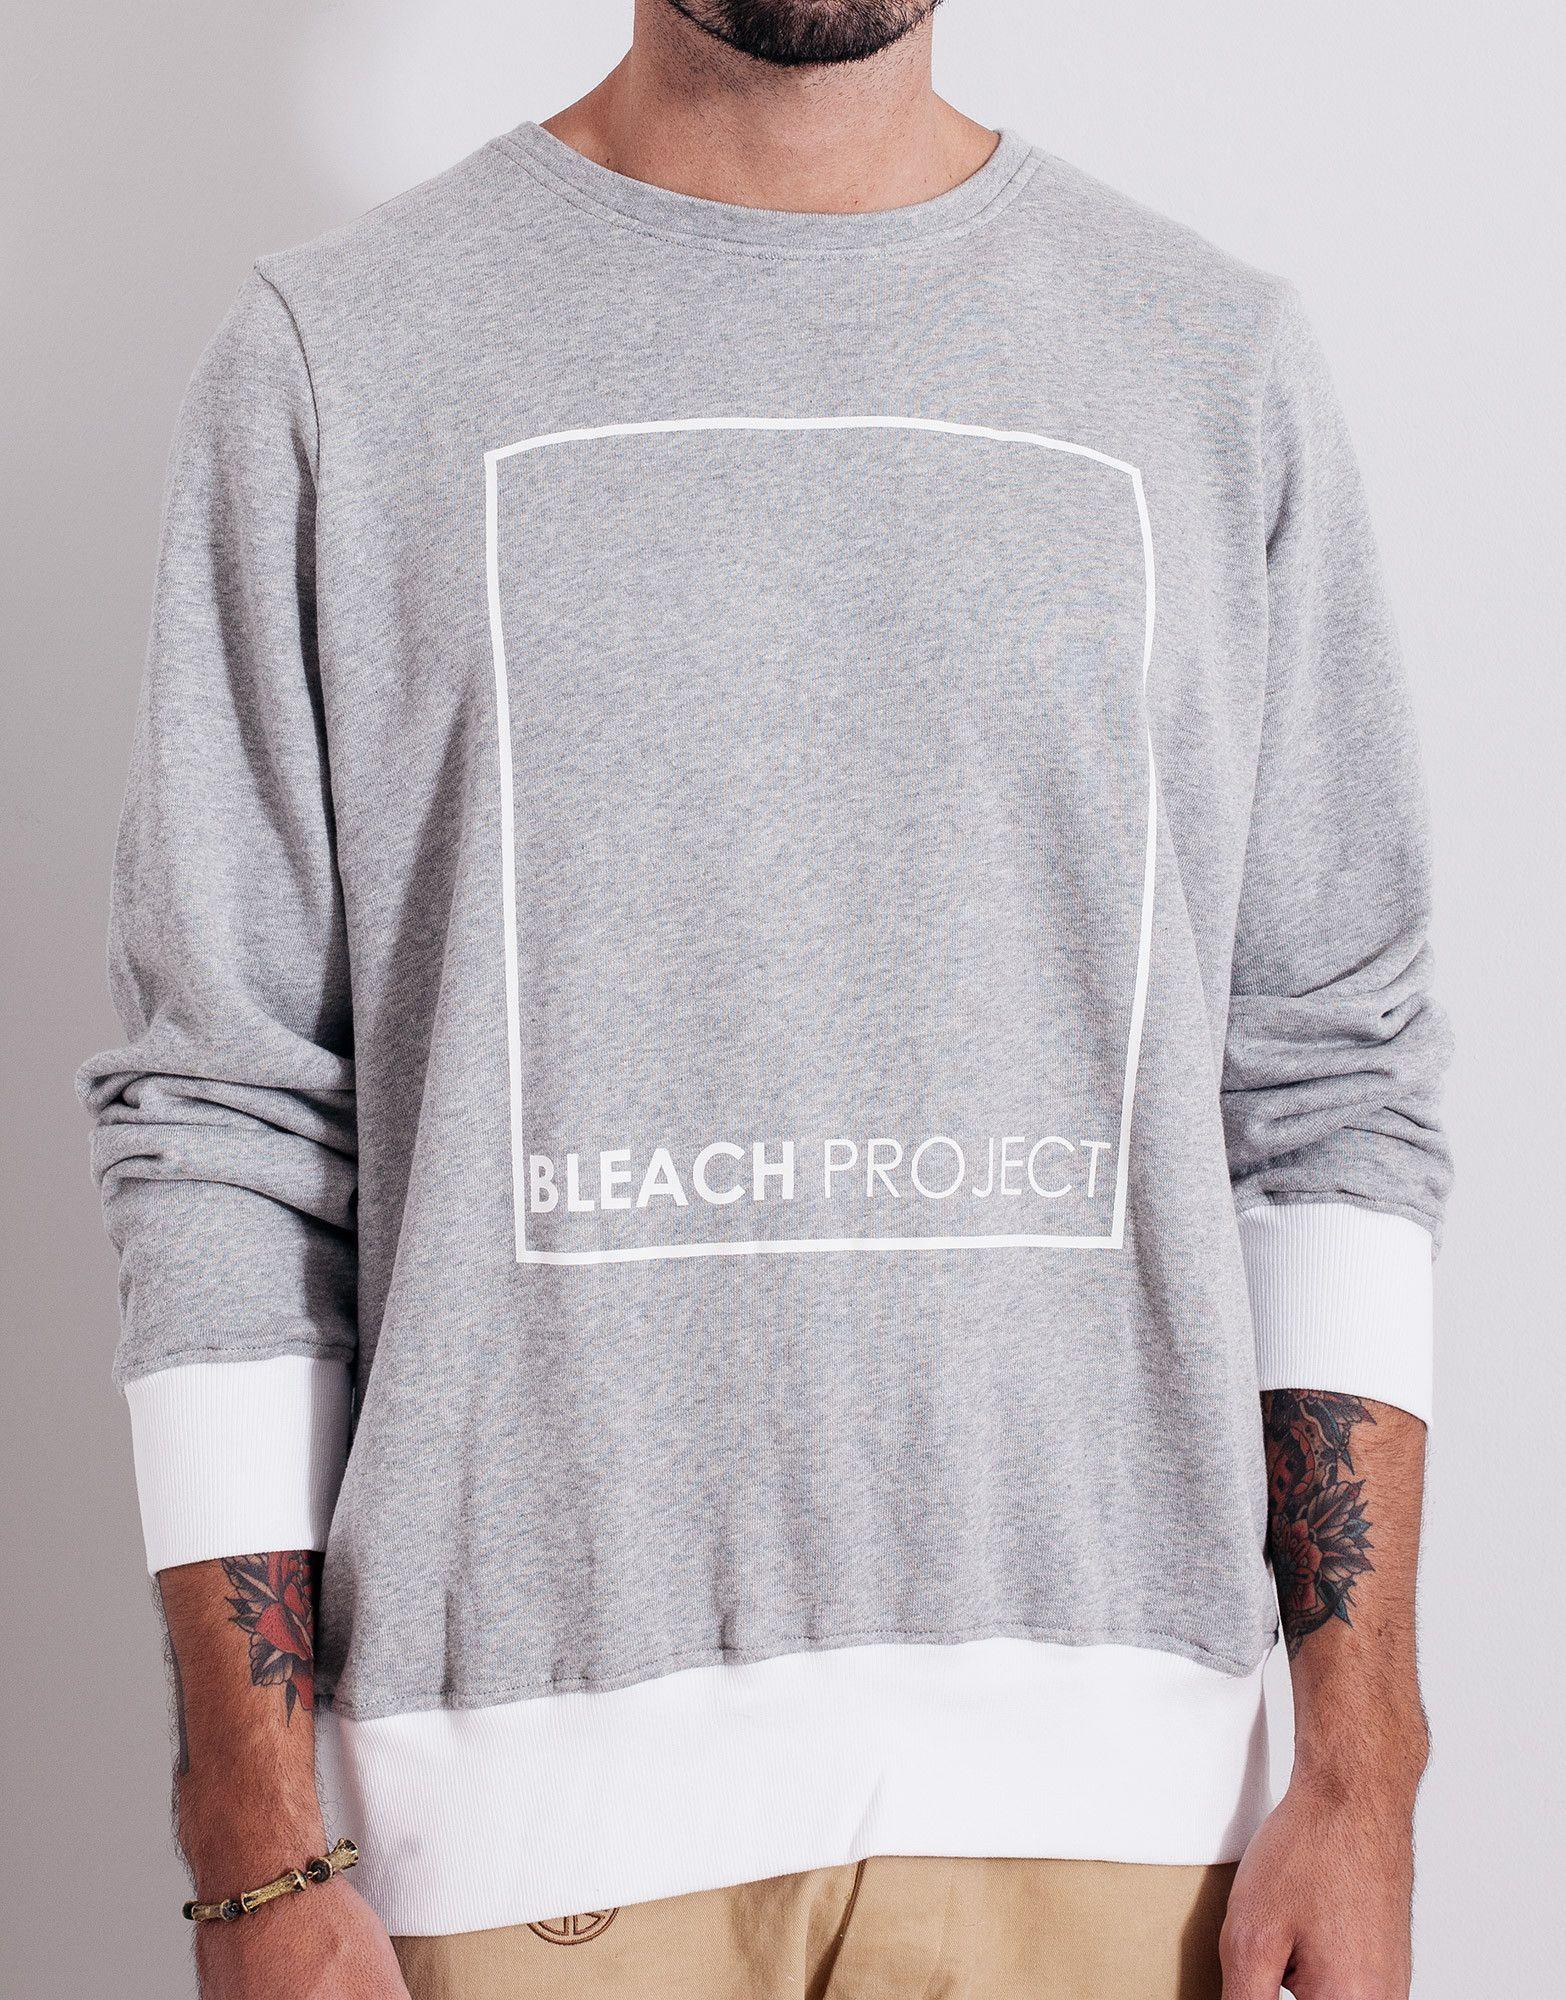 Bleach bp square sweater grey grey sweater sweaters